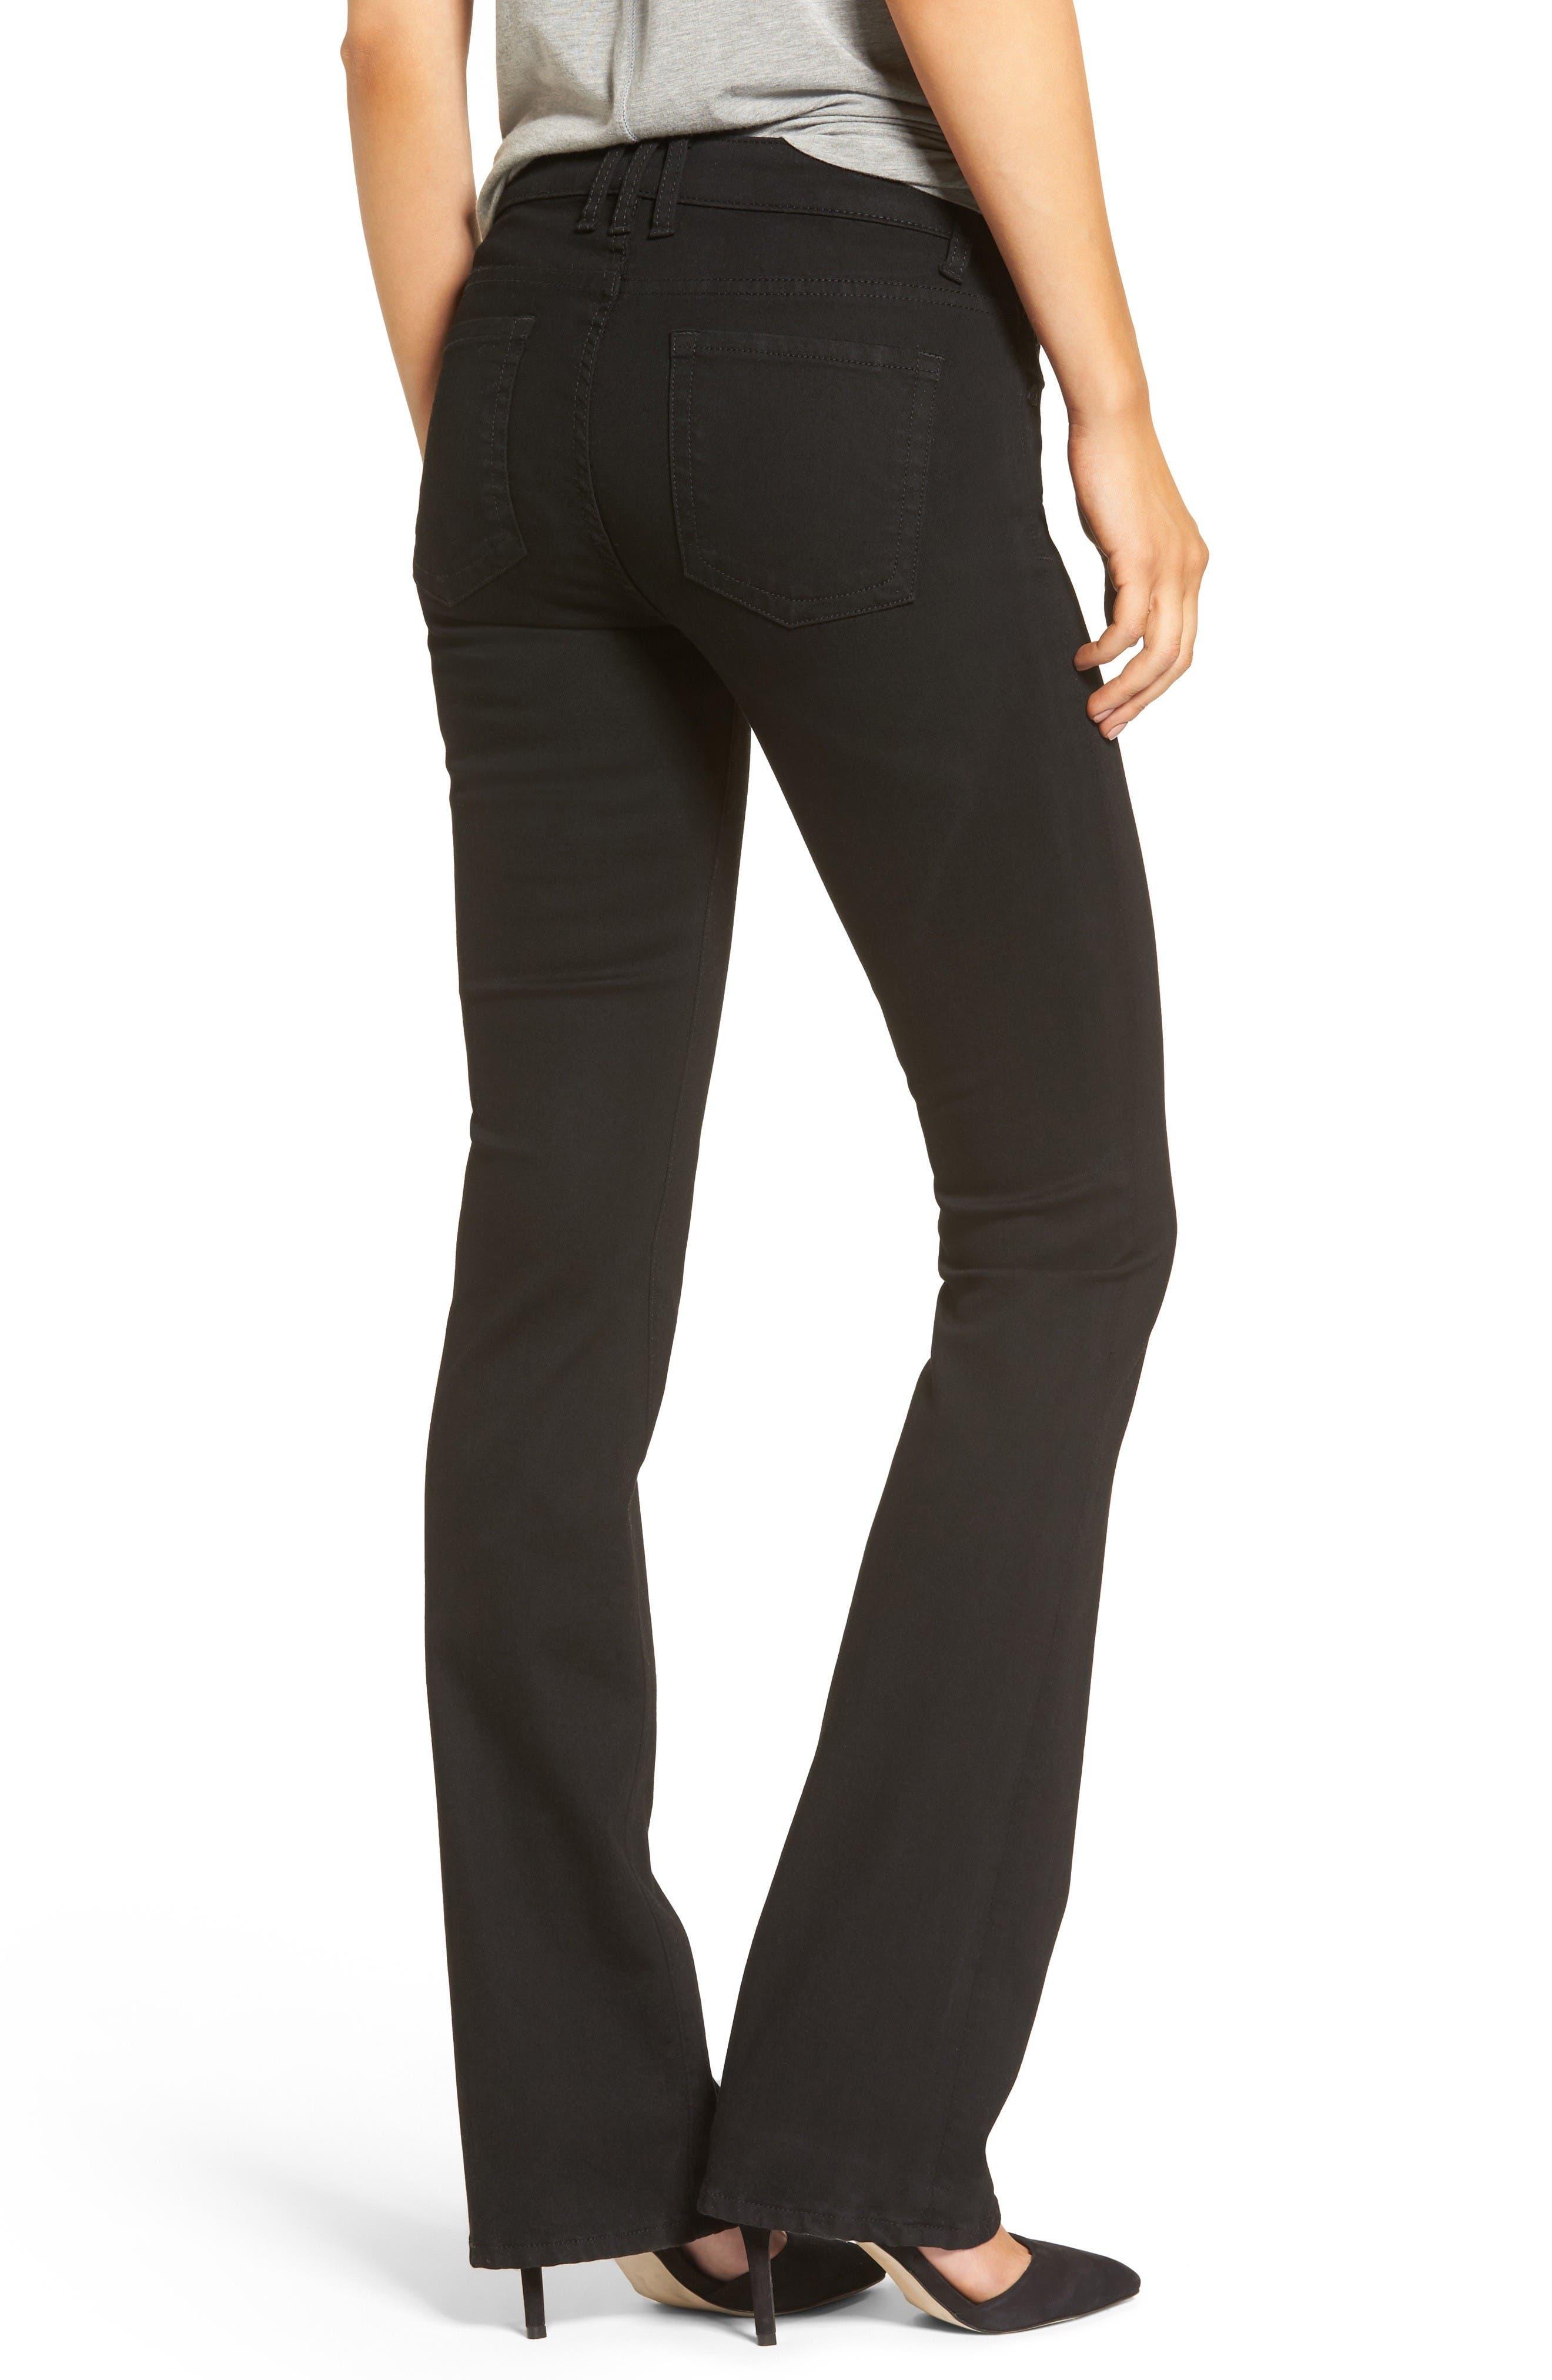 Alternate Image 2  - KUT from the Kloth Natalie Stretch Bootleg Jeans (Regular & Petite)